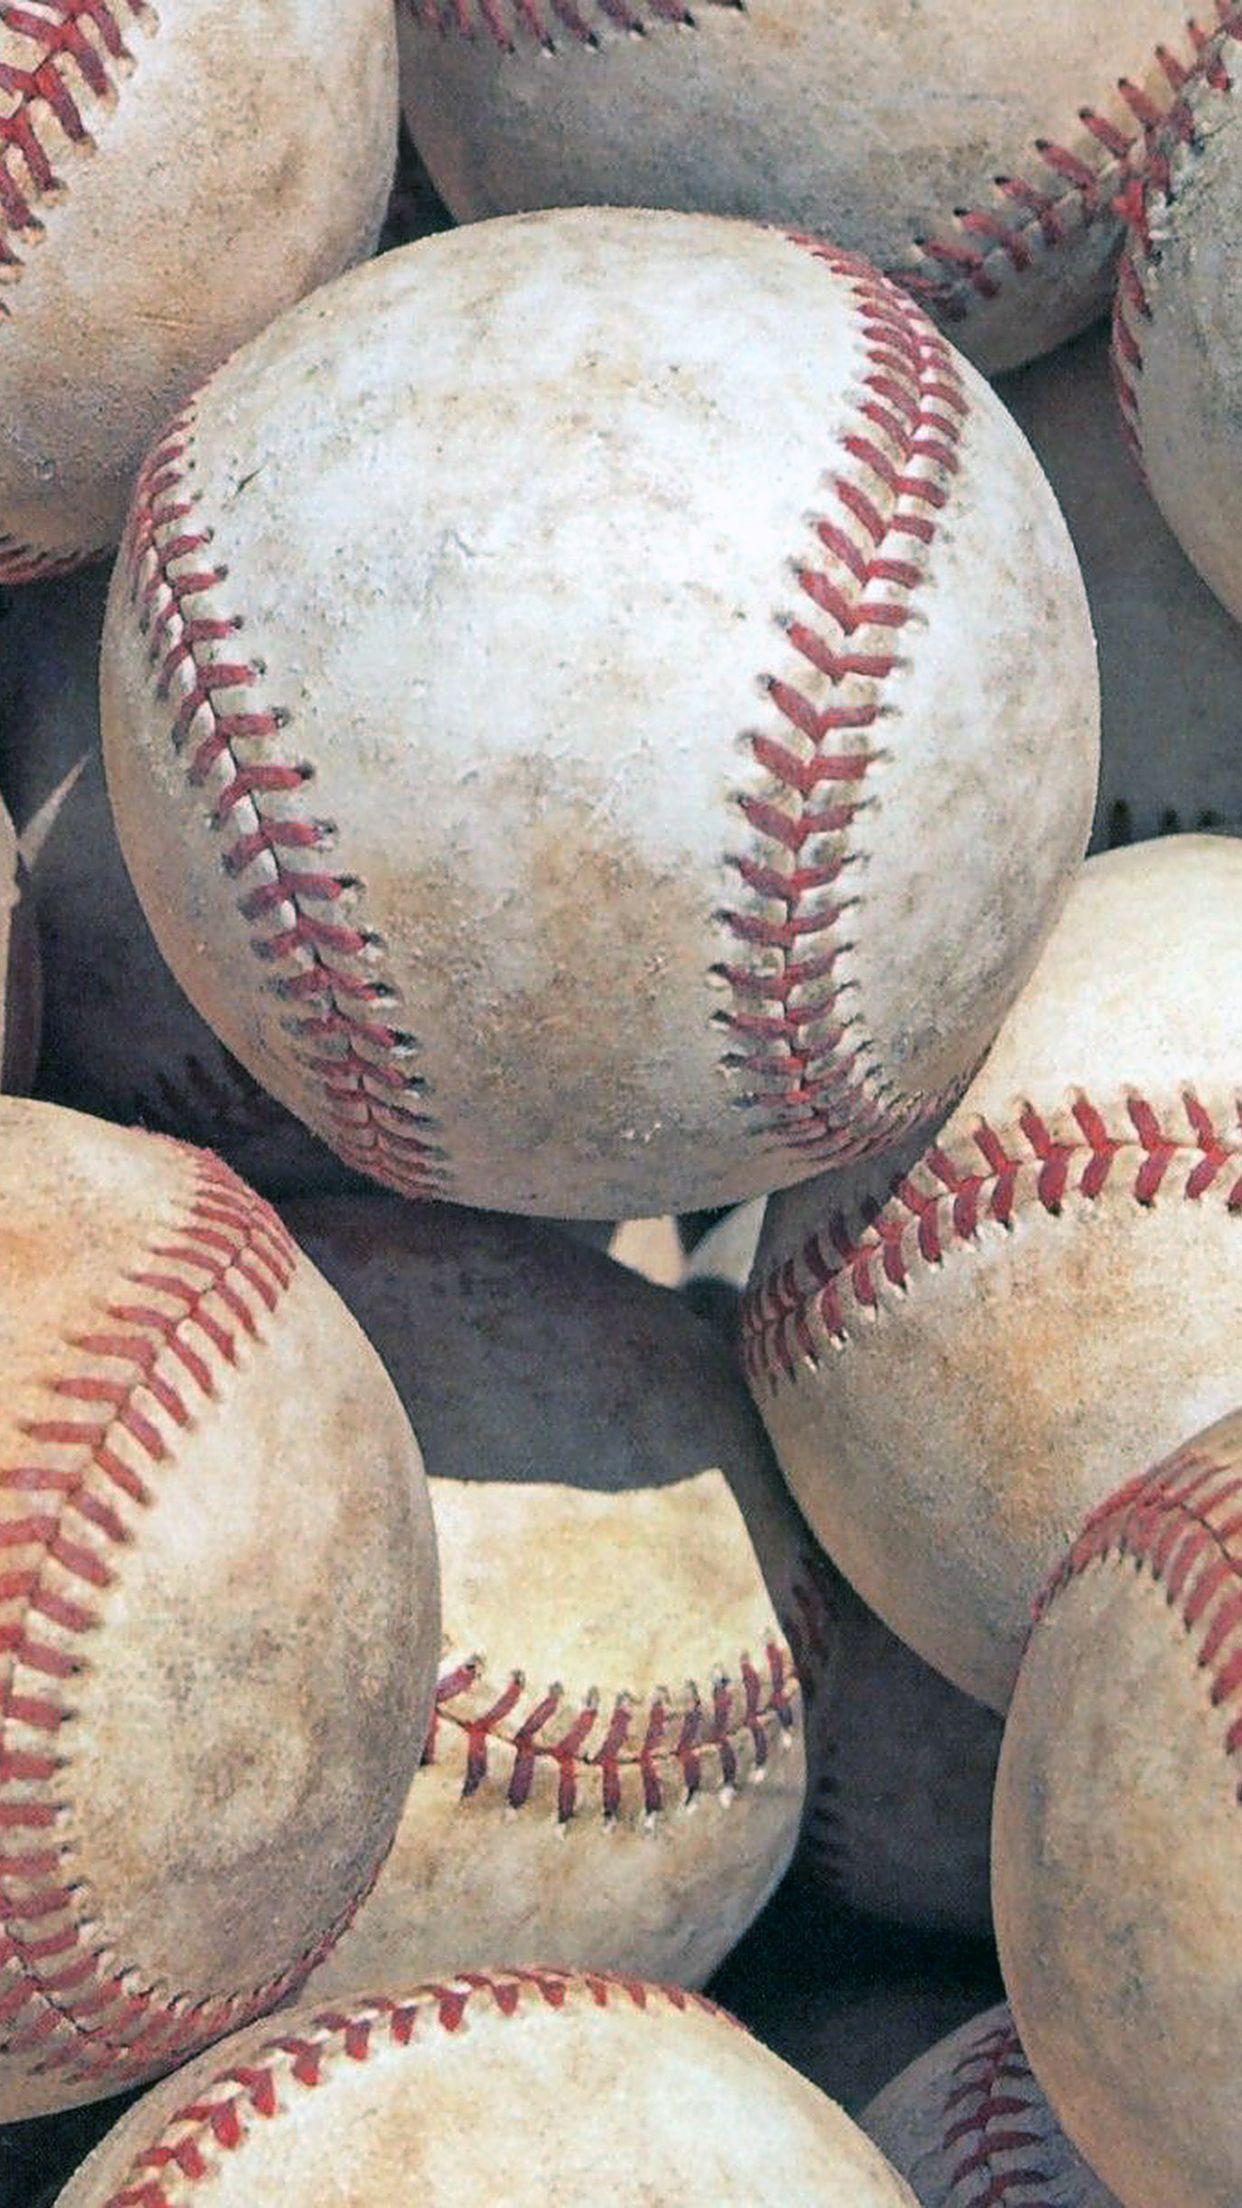 Iphone Baseball Wallpapers Top Free Iphone Baseball